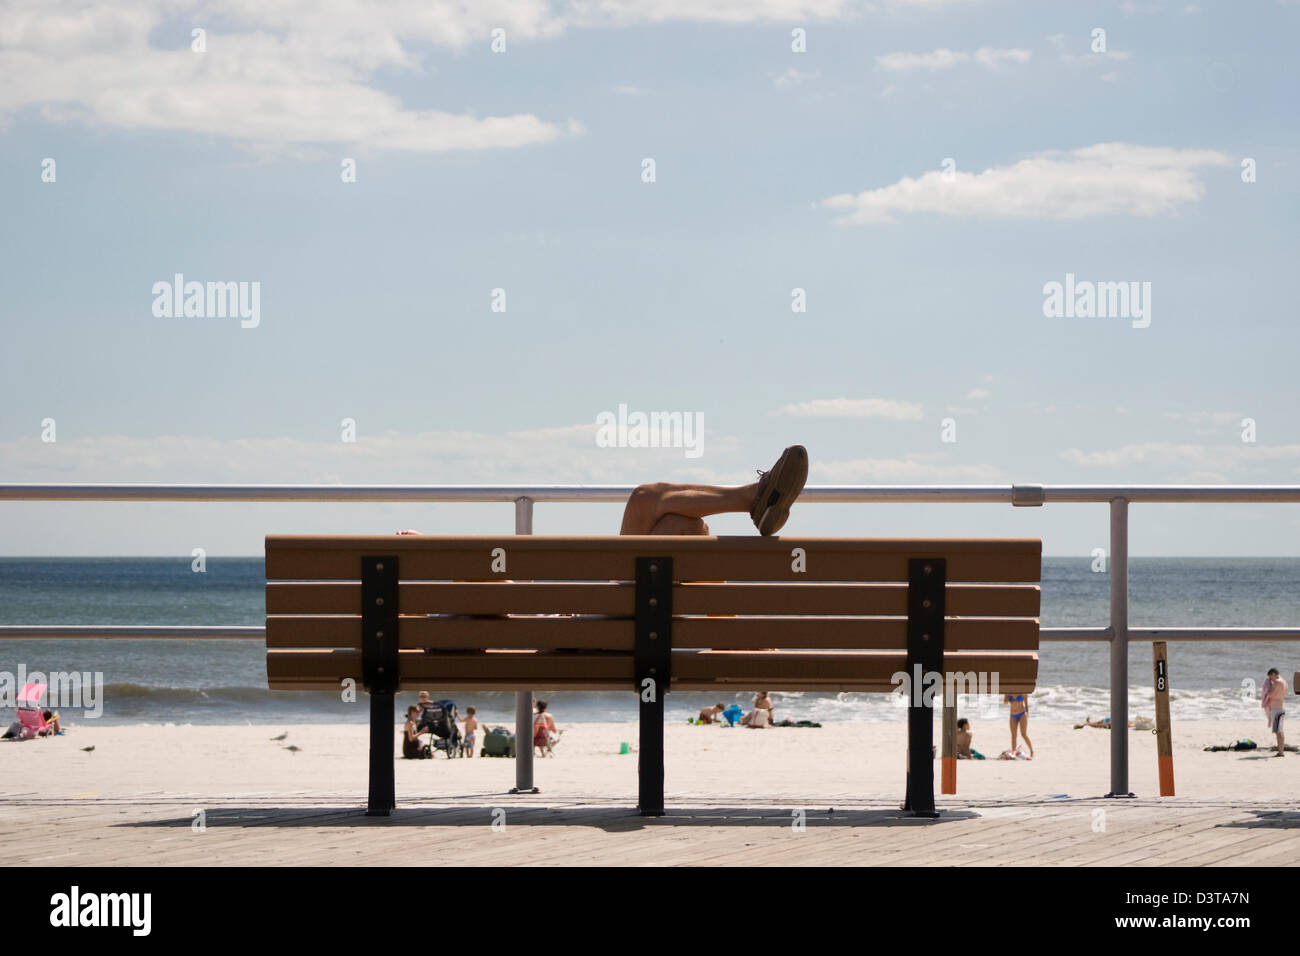 A beach-goer relaxes on a Long Beach, New York boardwalk bench. - Stock Image